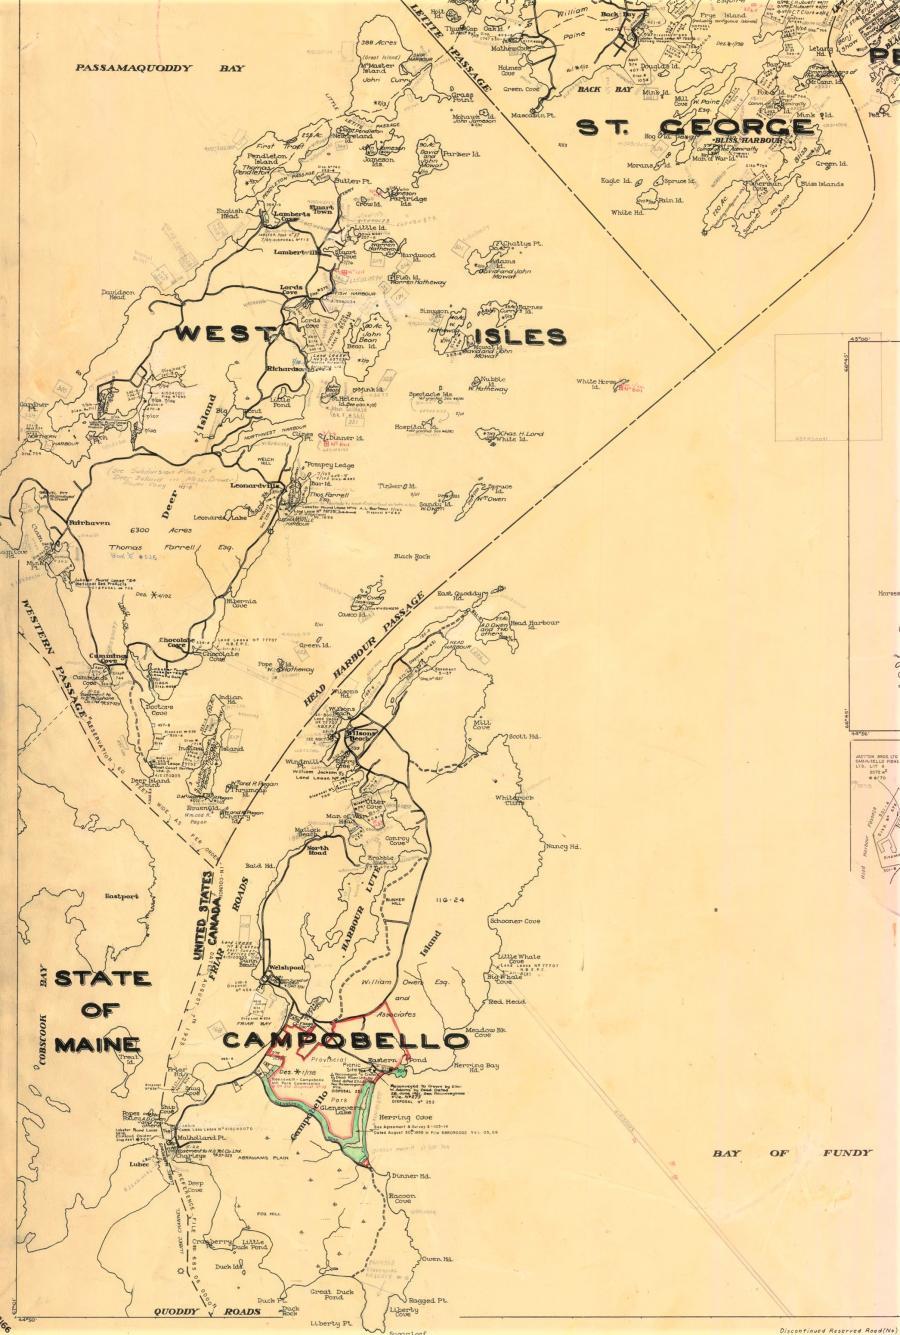 Land grant map